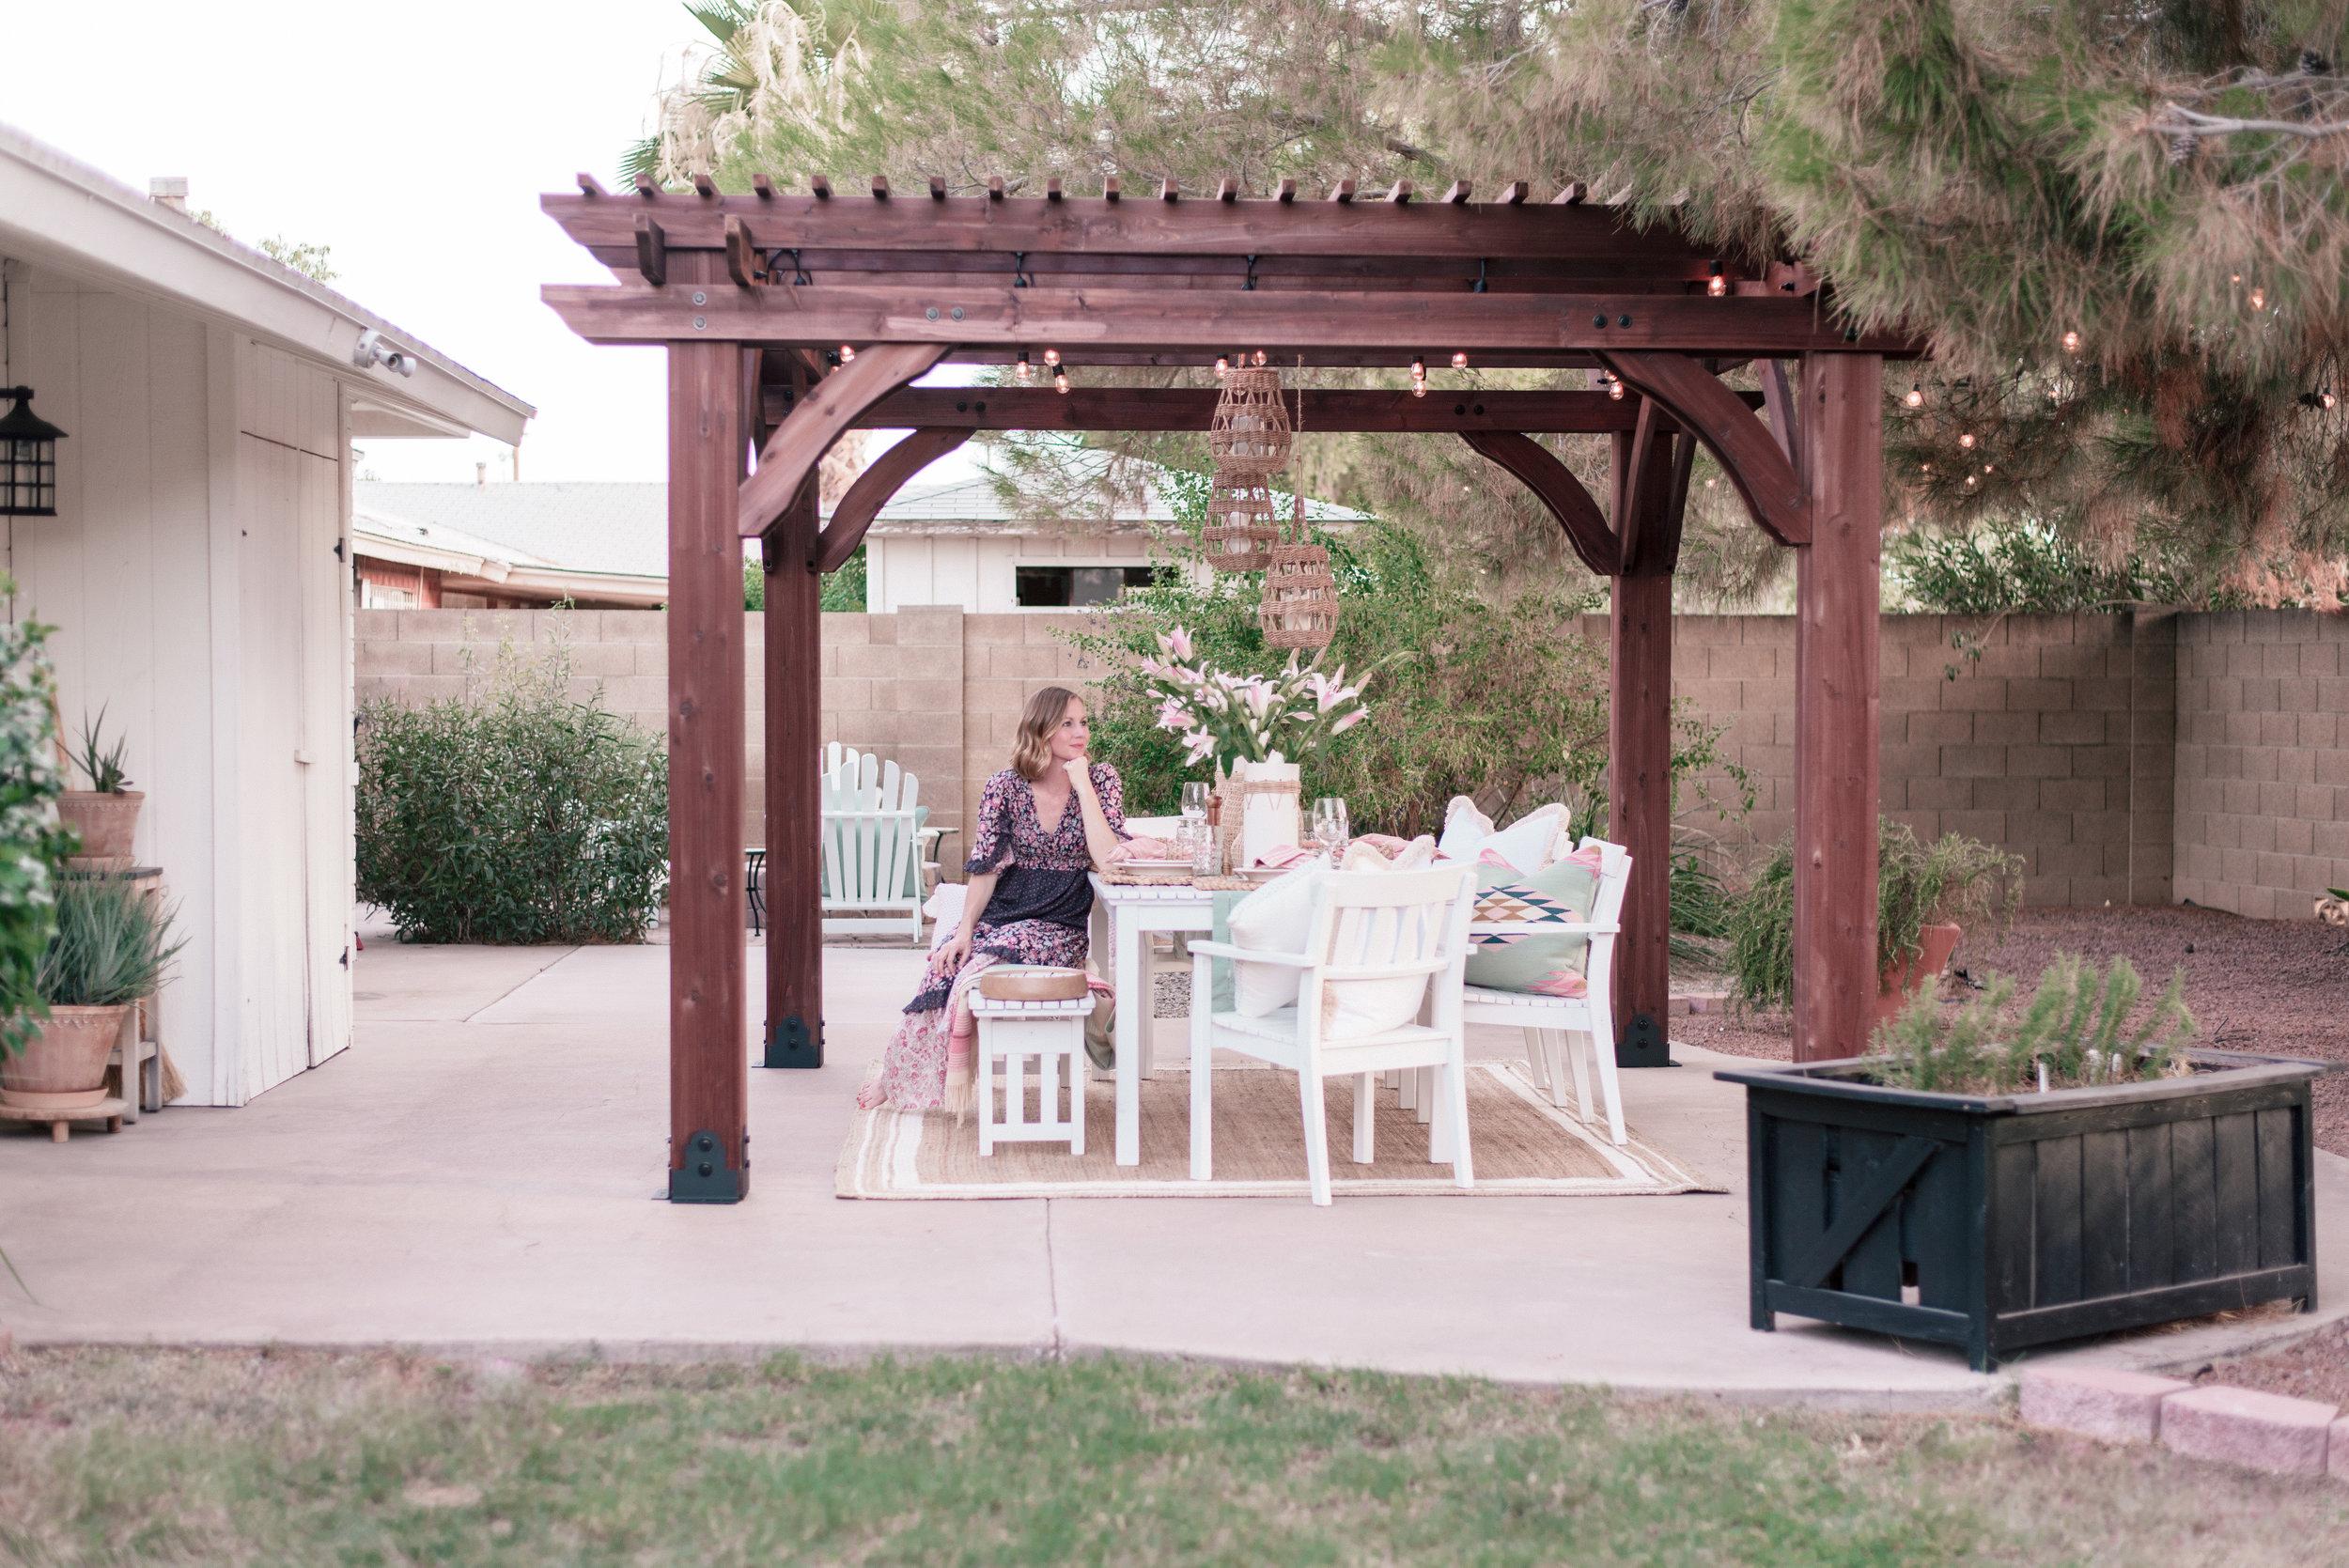 home-depot-backyard-patio-pergola-8.jpg